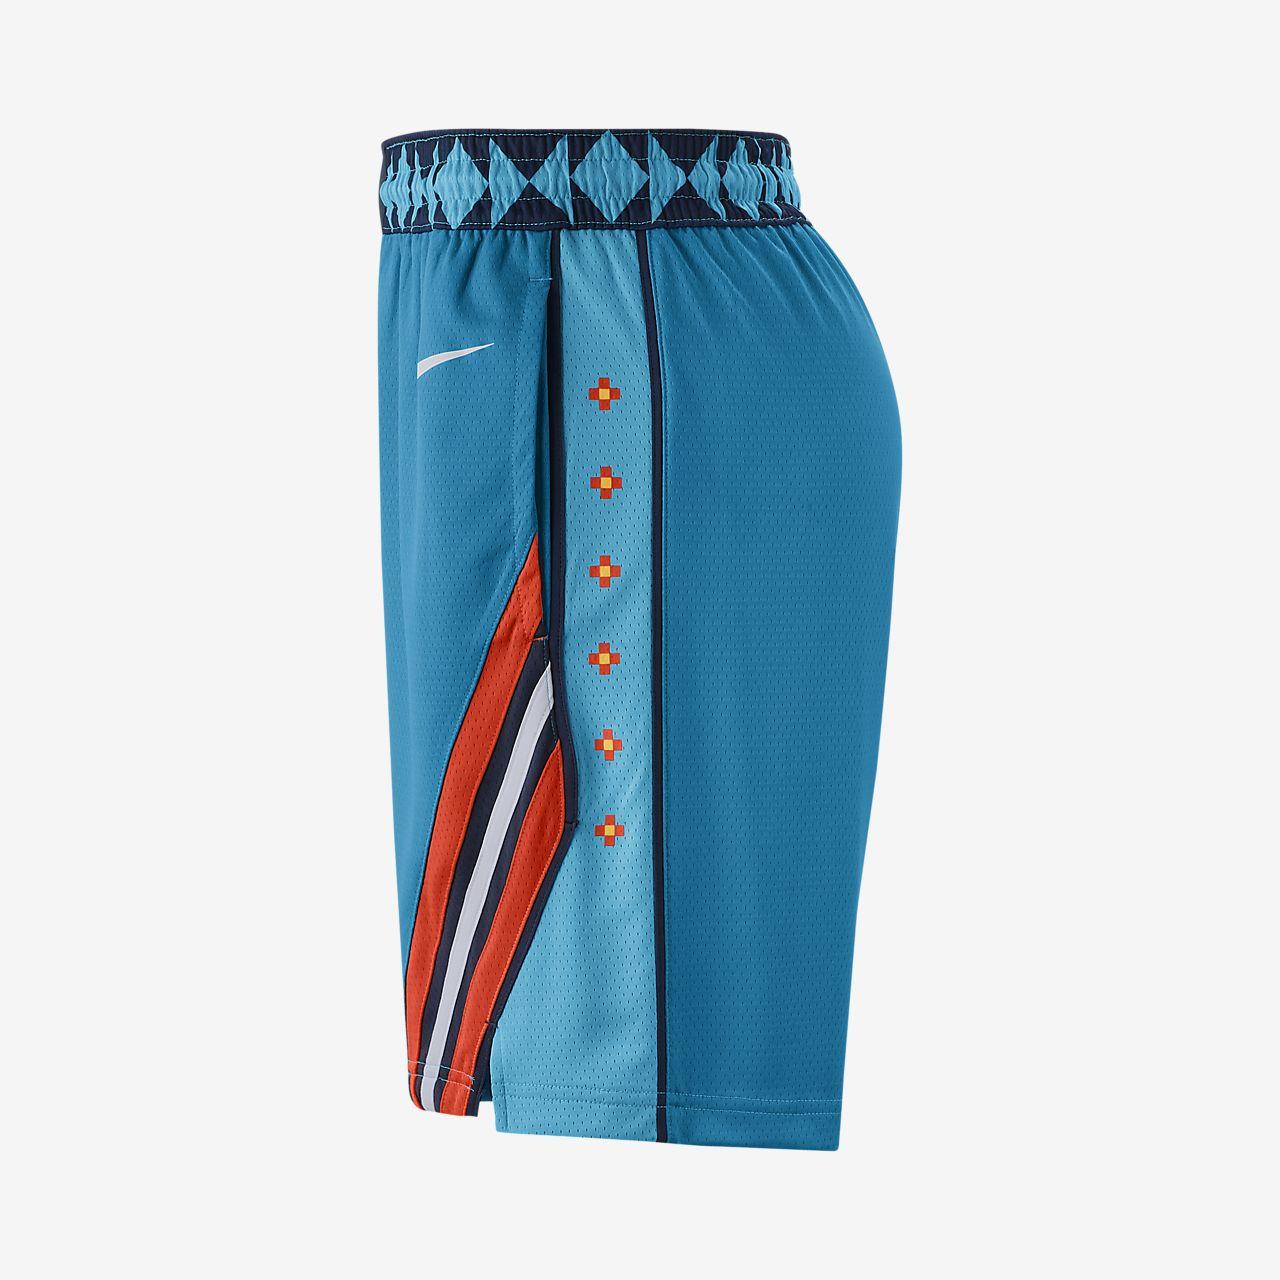 6e4d481891e ... Oklahoma City Thunder City Edition Swingman Men's Nike NBA Shorts